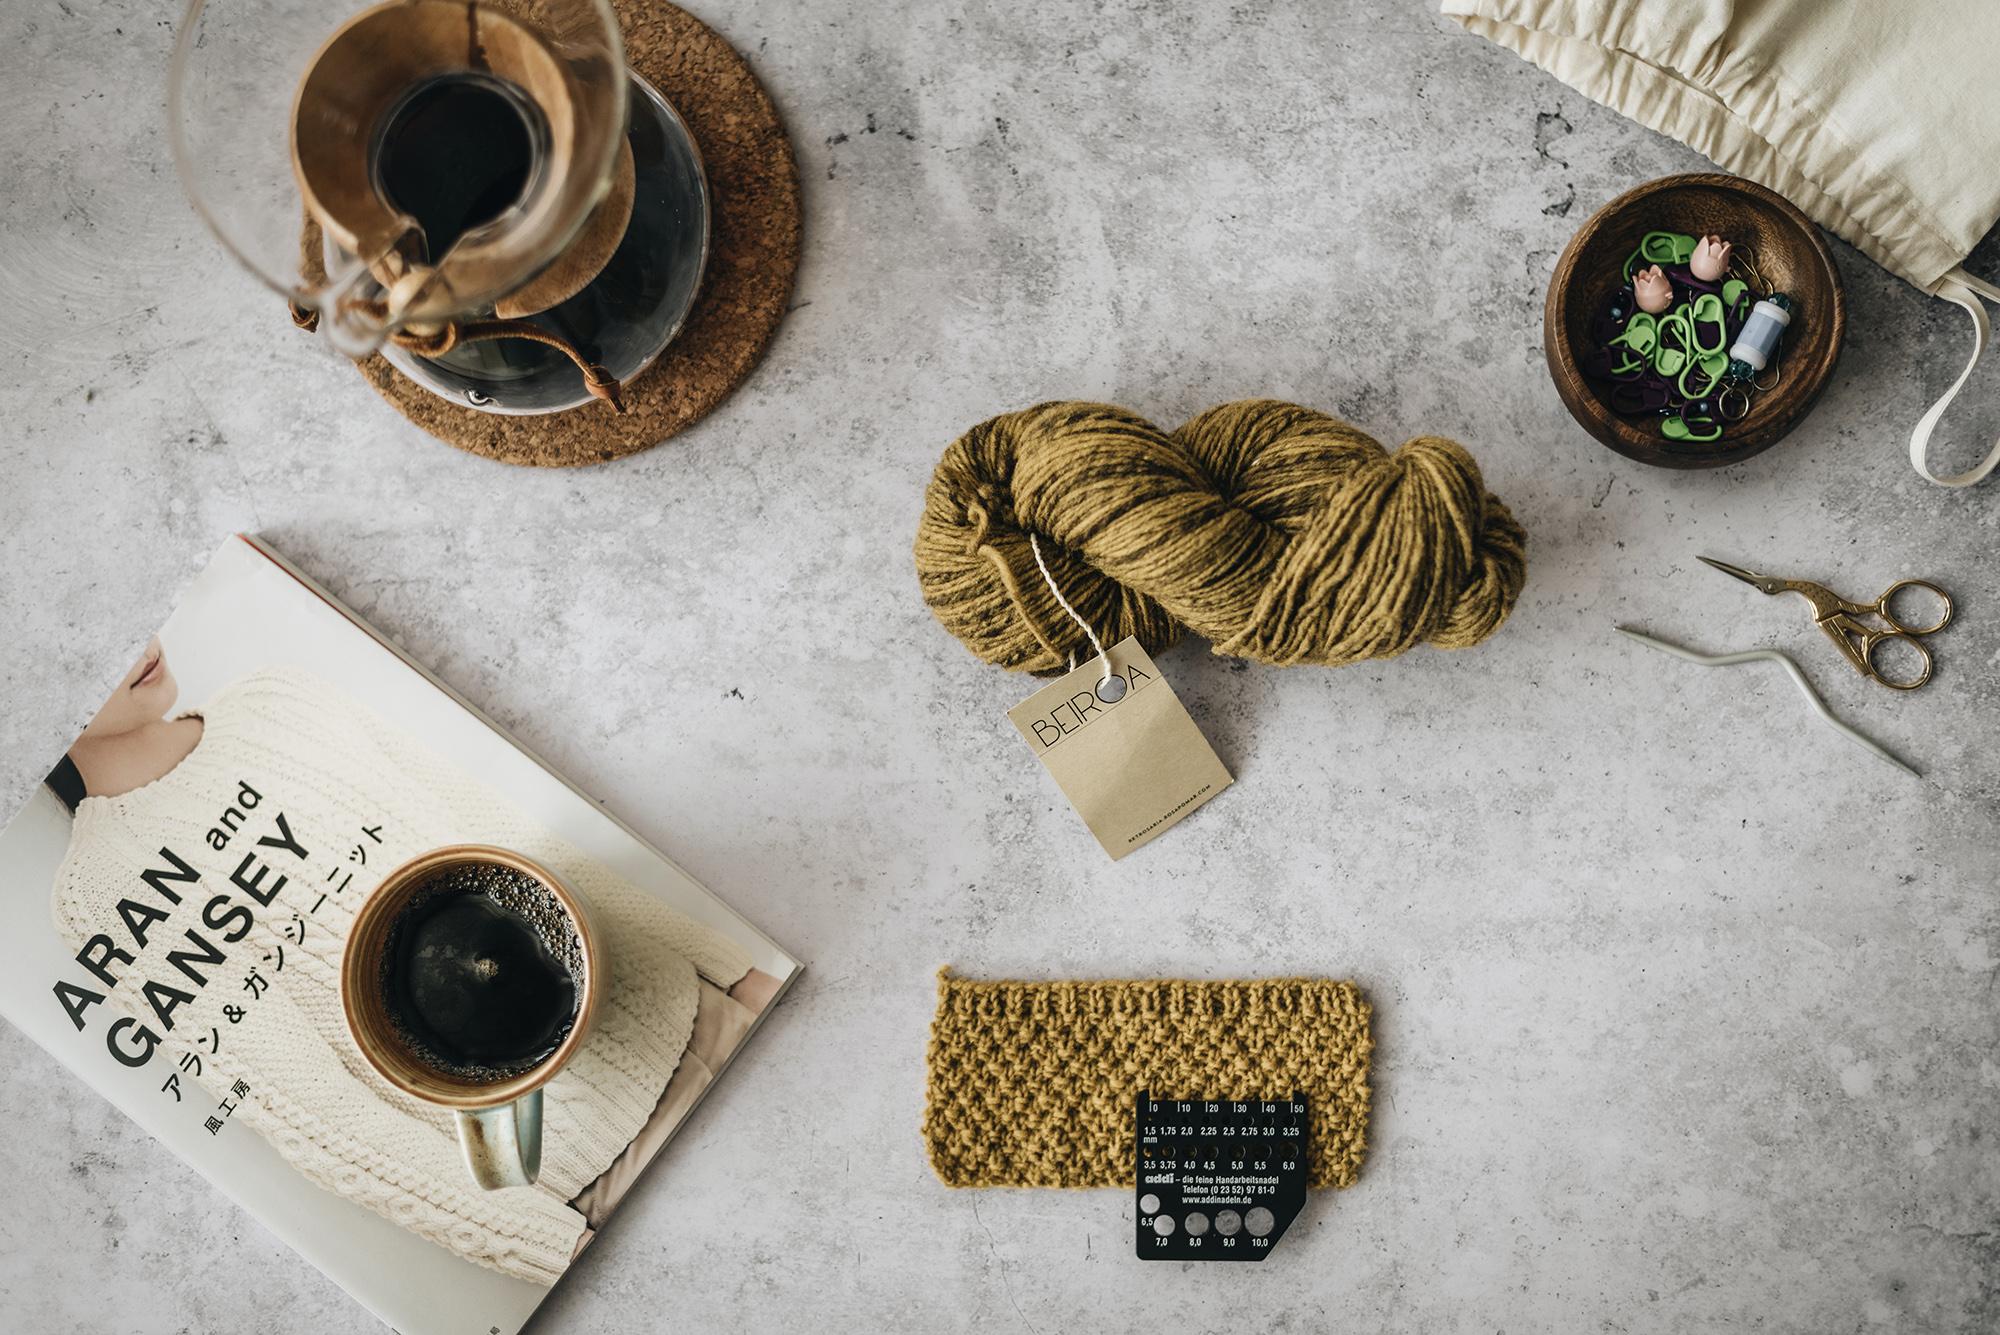 Aran and gansey-beiroa rosa pomar-coffee chemex-table-yellowish-2019-patricia-martins